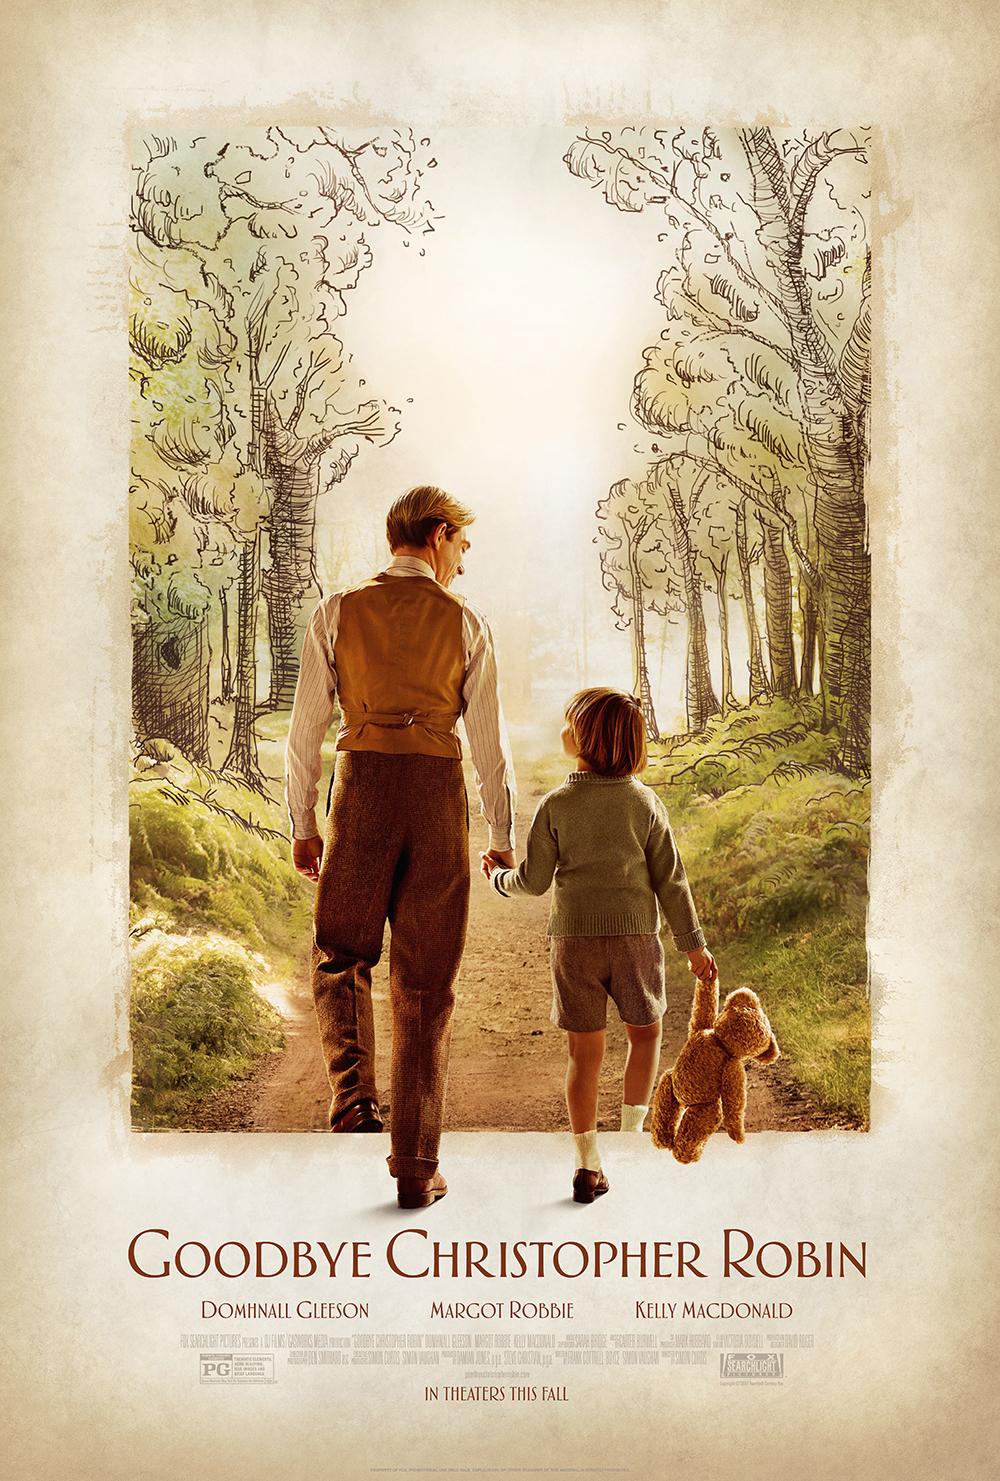 Movie sneak peek: Goodbye Christopher Robin